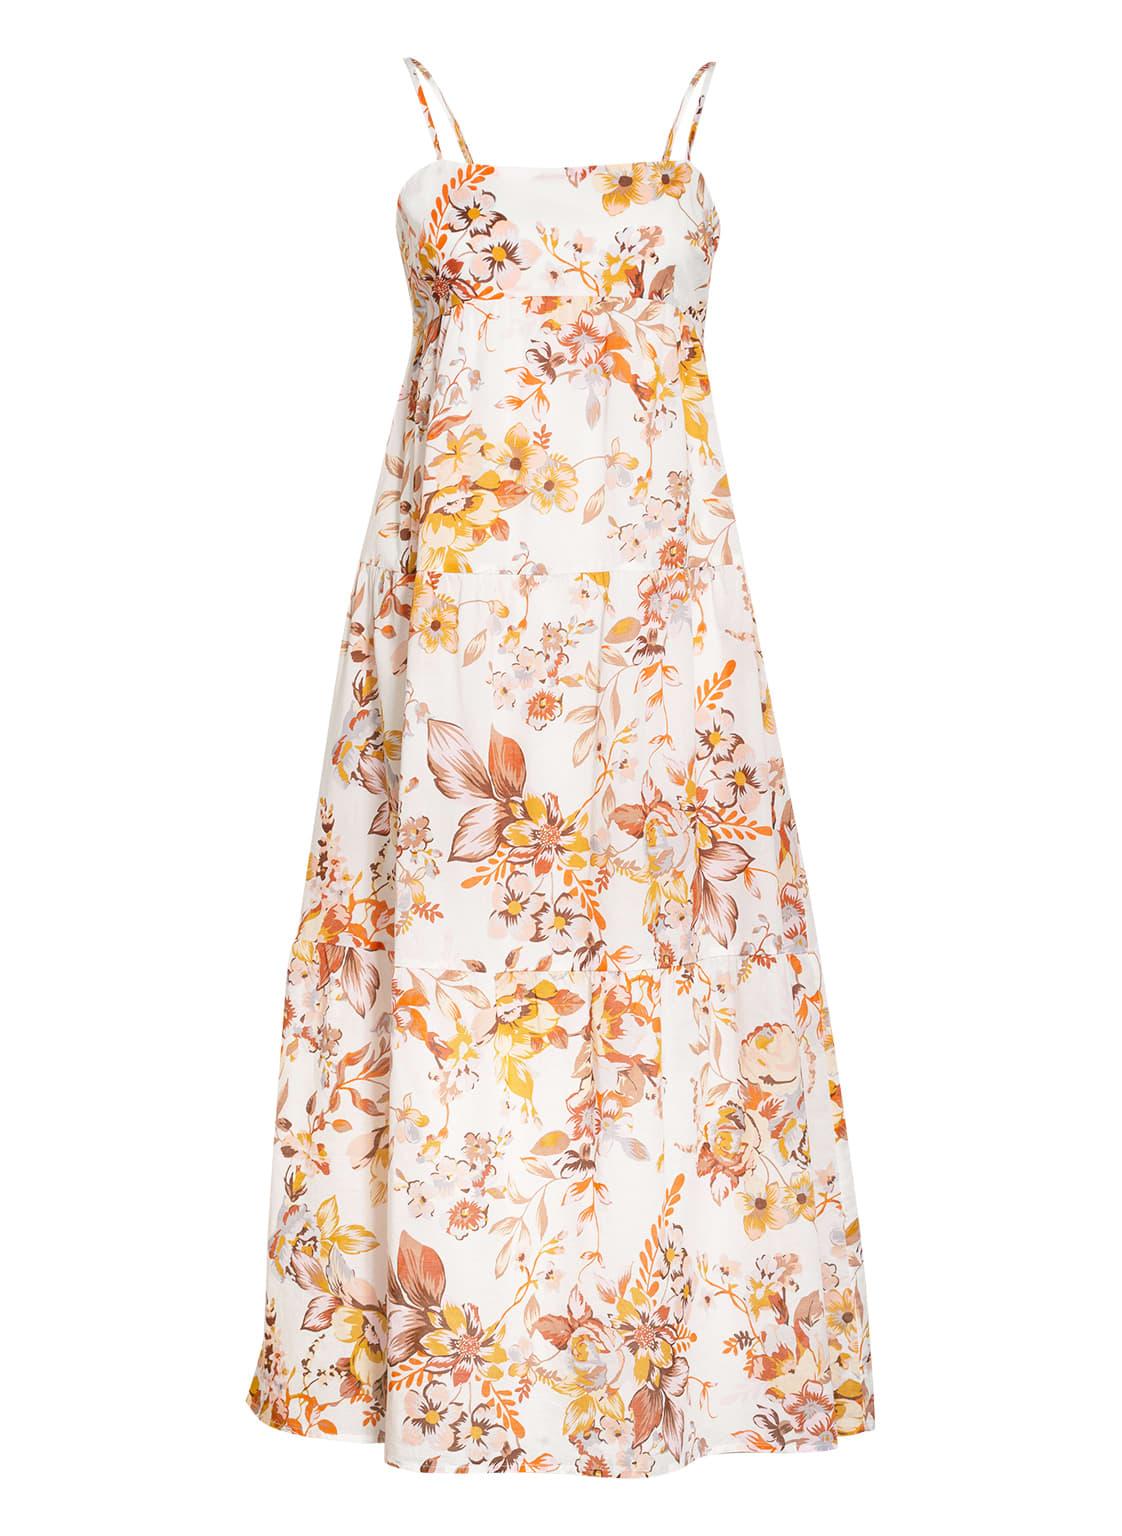 Image of Bardot Kleid beige